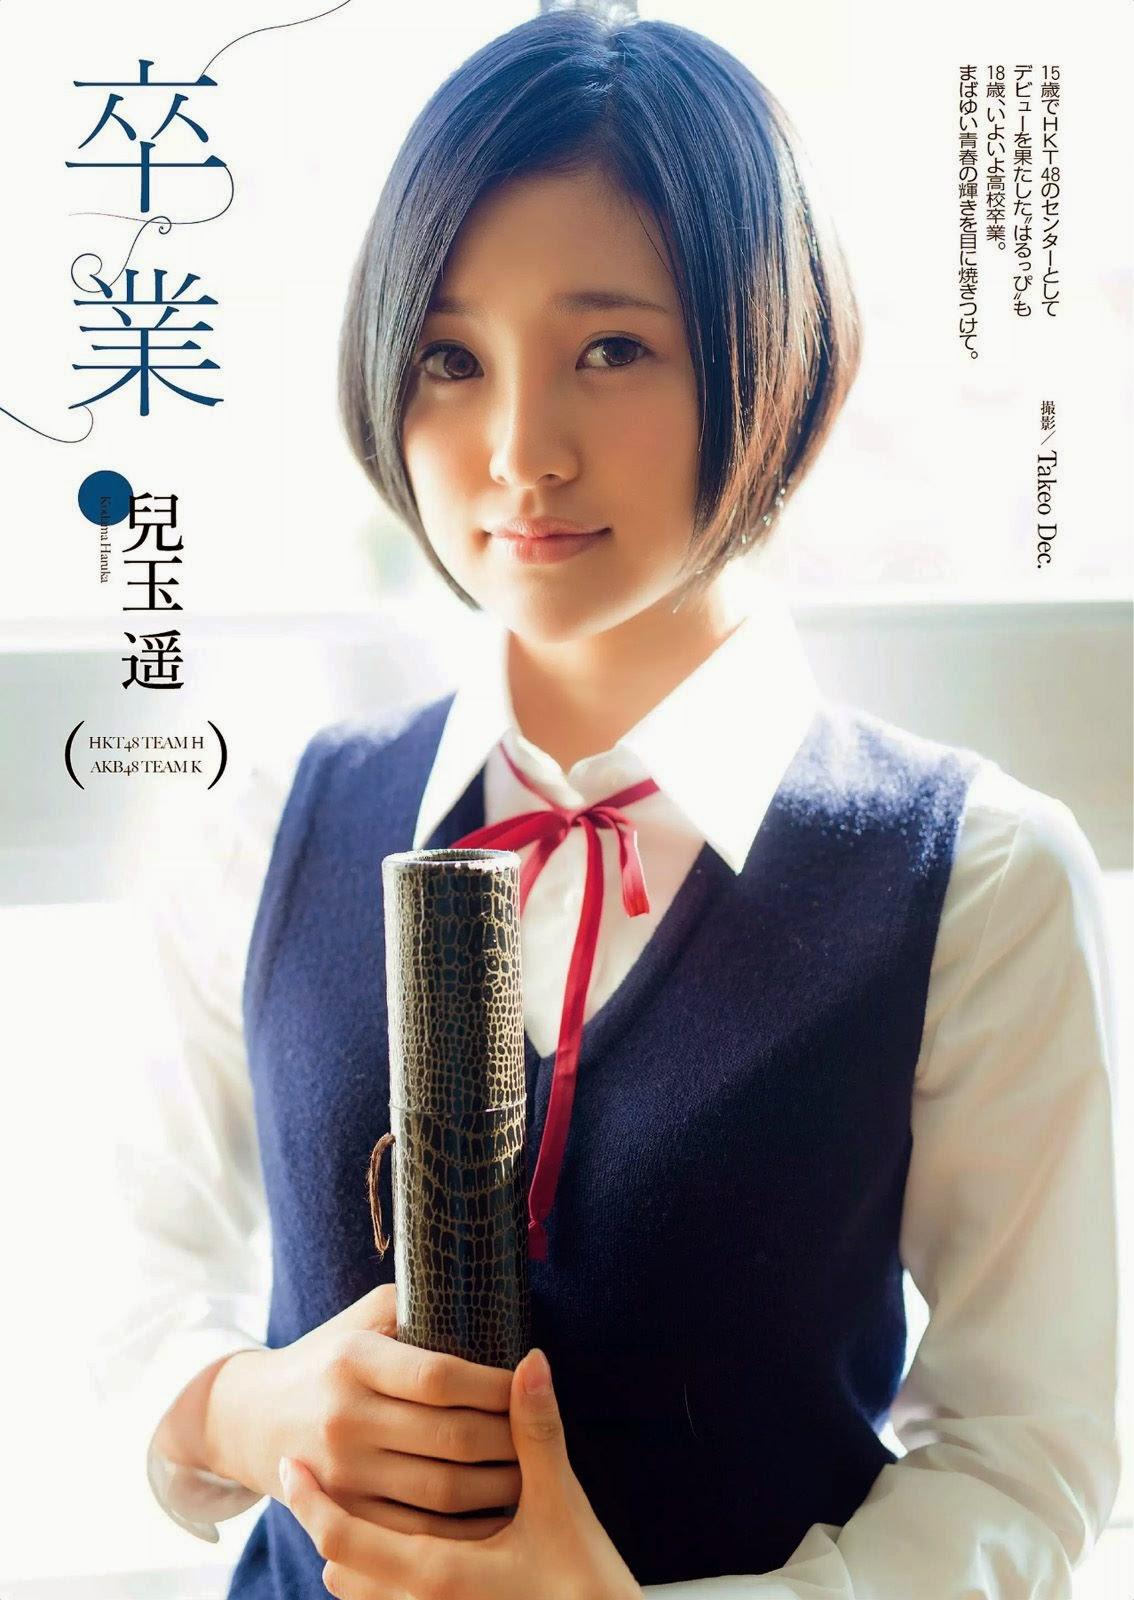 Kodama Haruka 兒玉遥 Weekly Playboy March 2015 Images 01